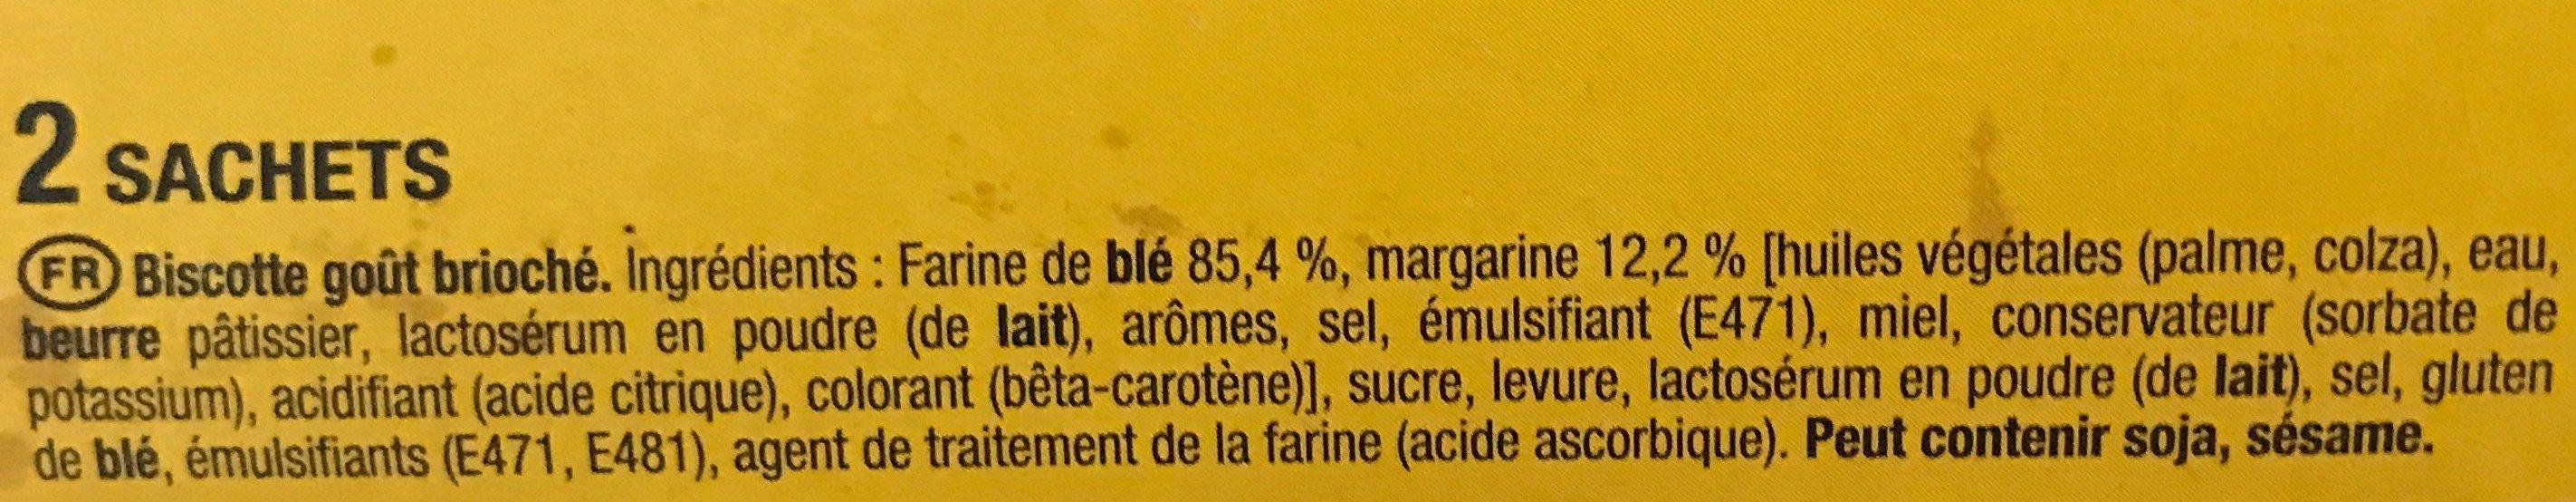 Heudebert La Biscotte Goût Brioché - Ingredients - fr